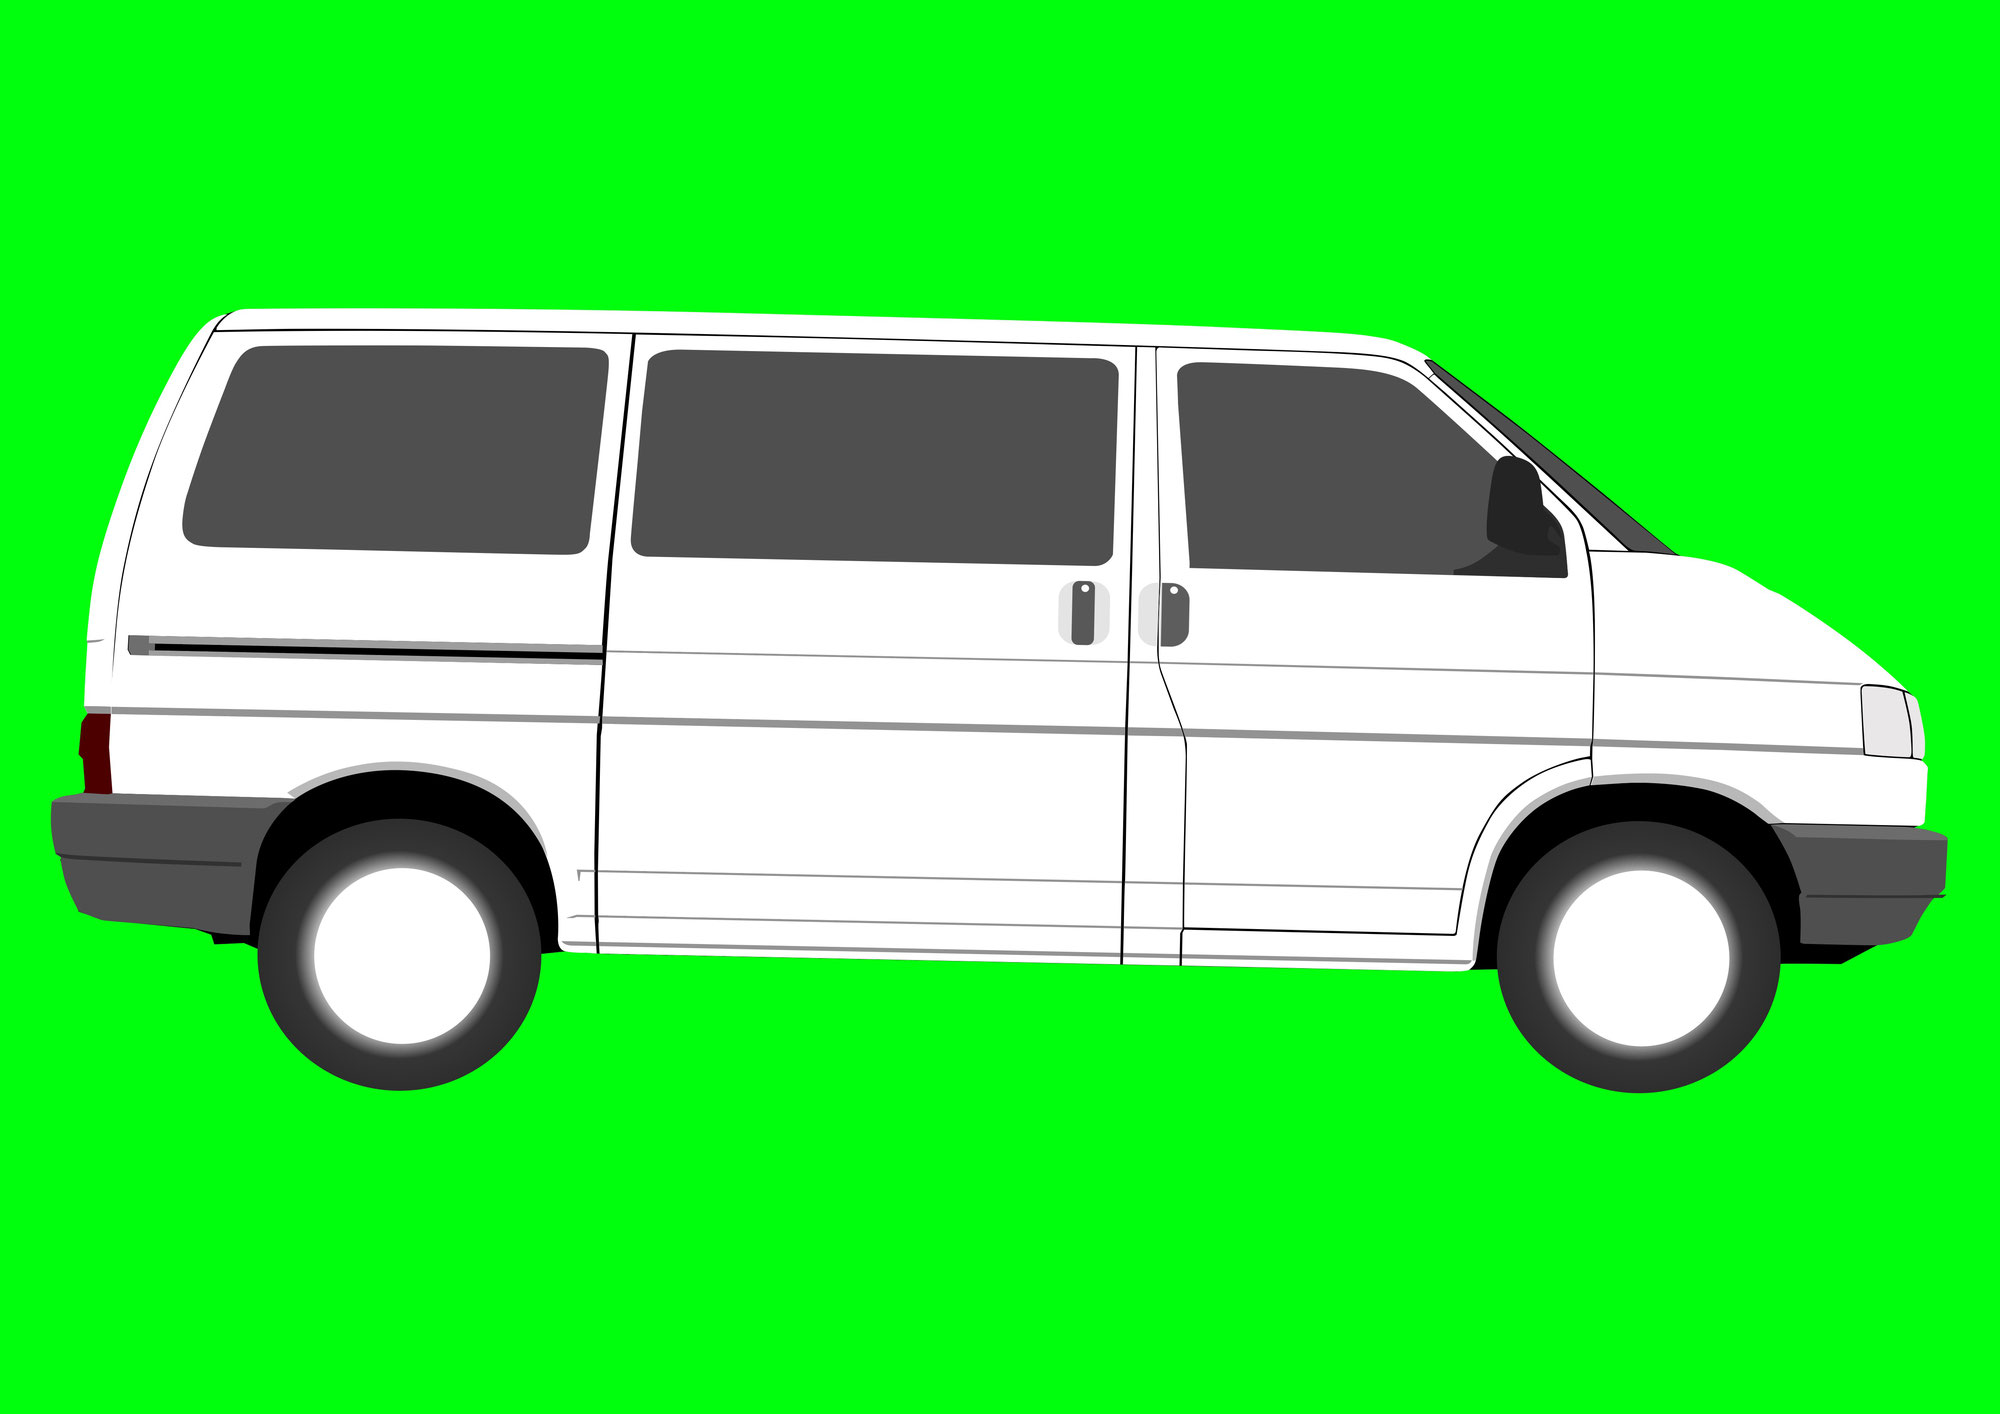 VW T4 Transporter als Vektorgrafik